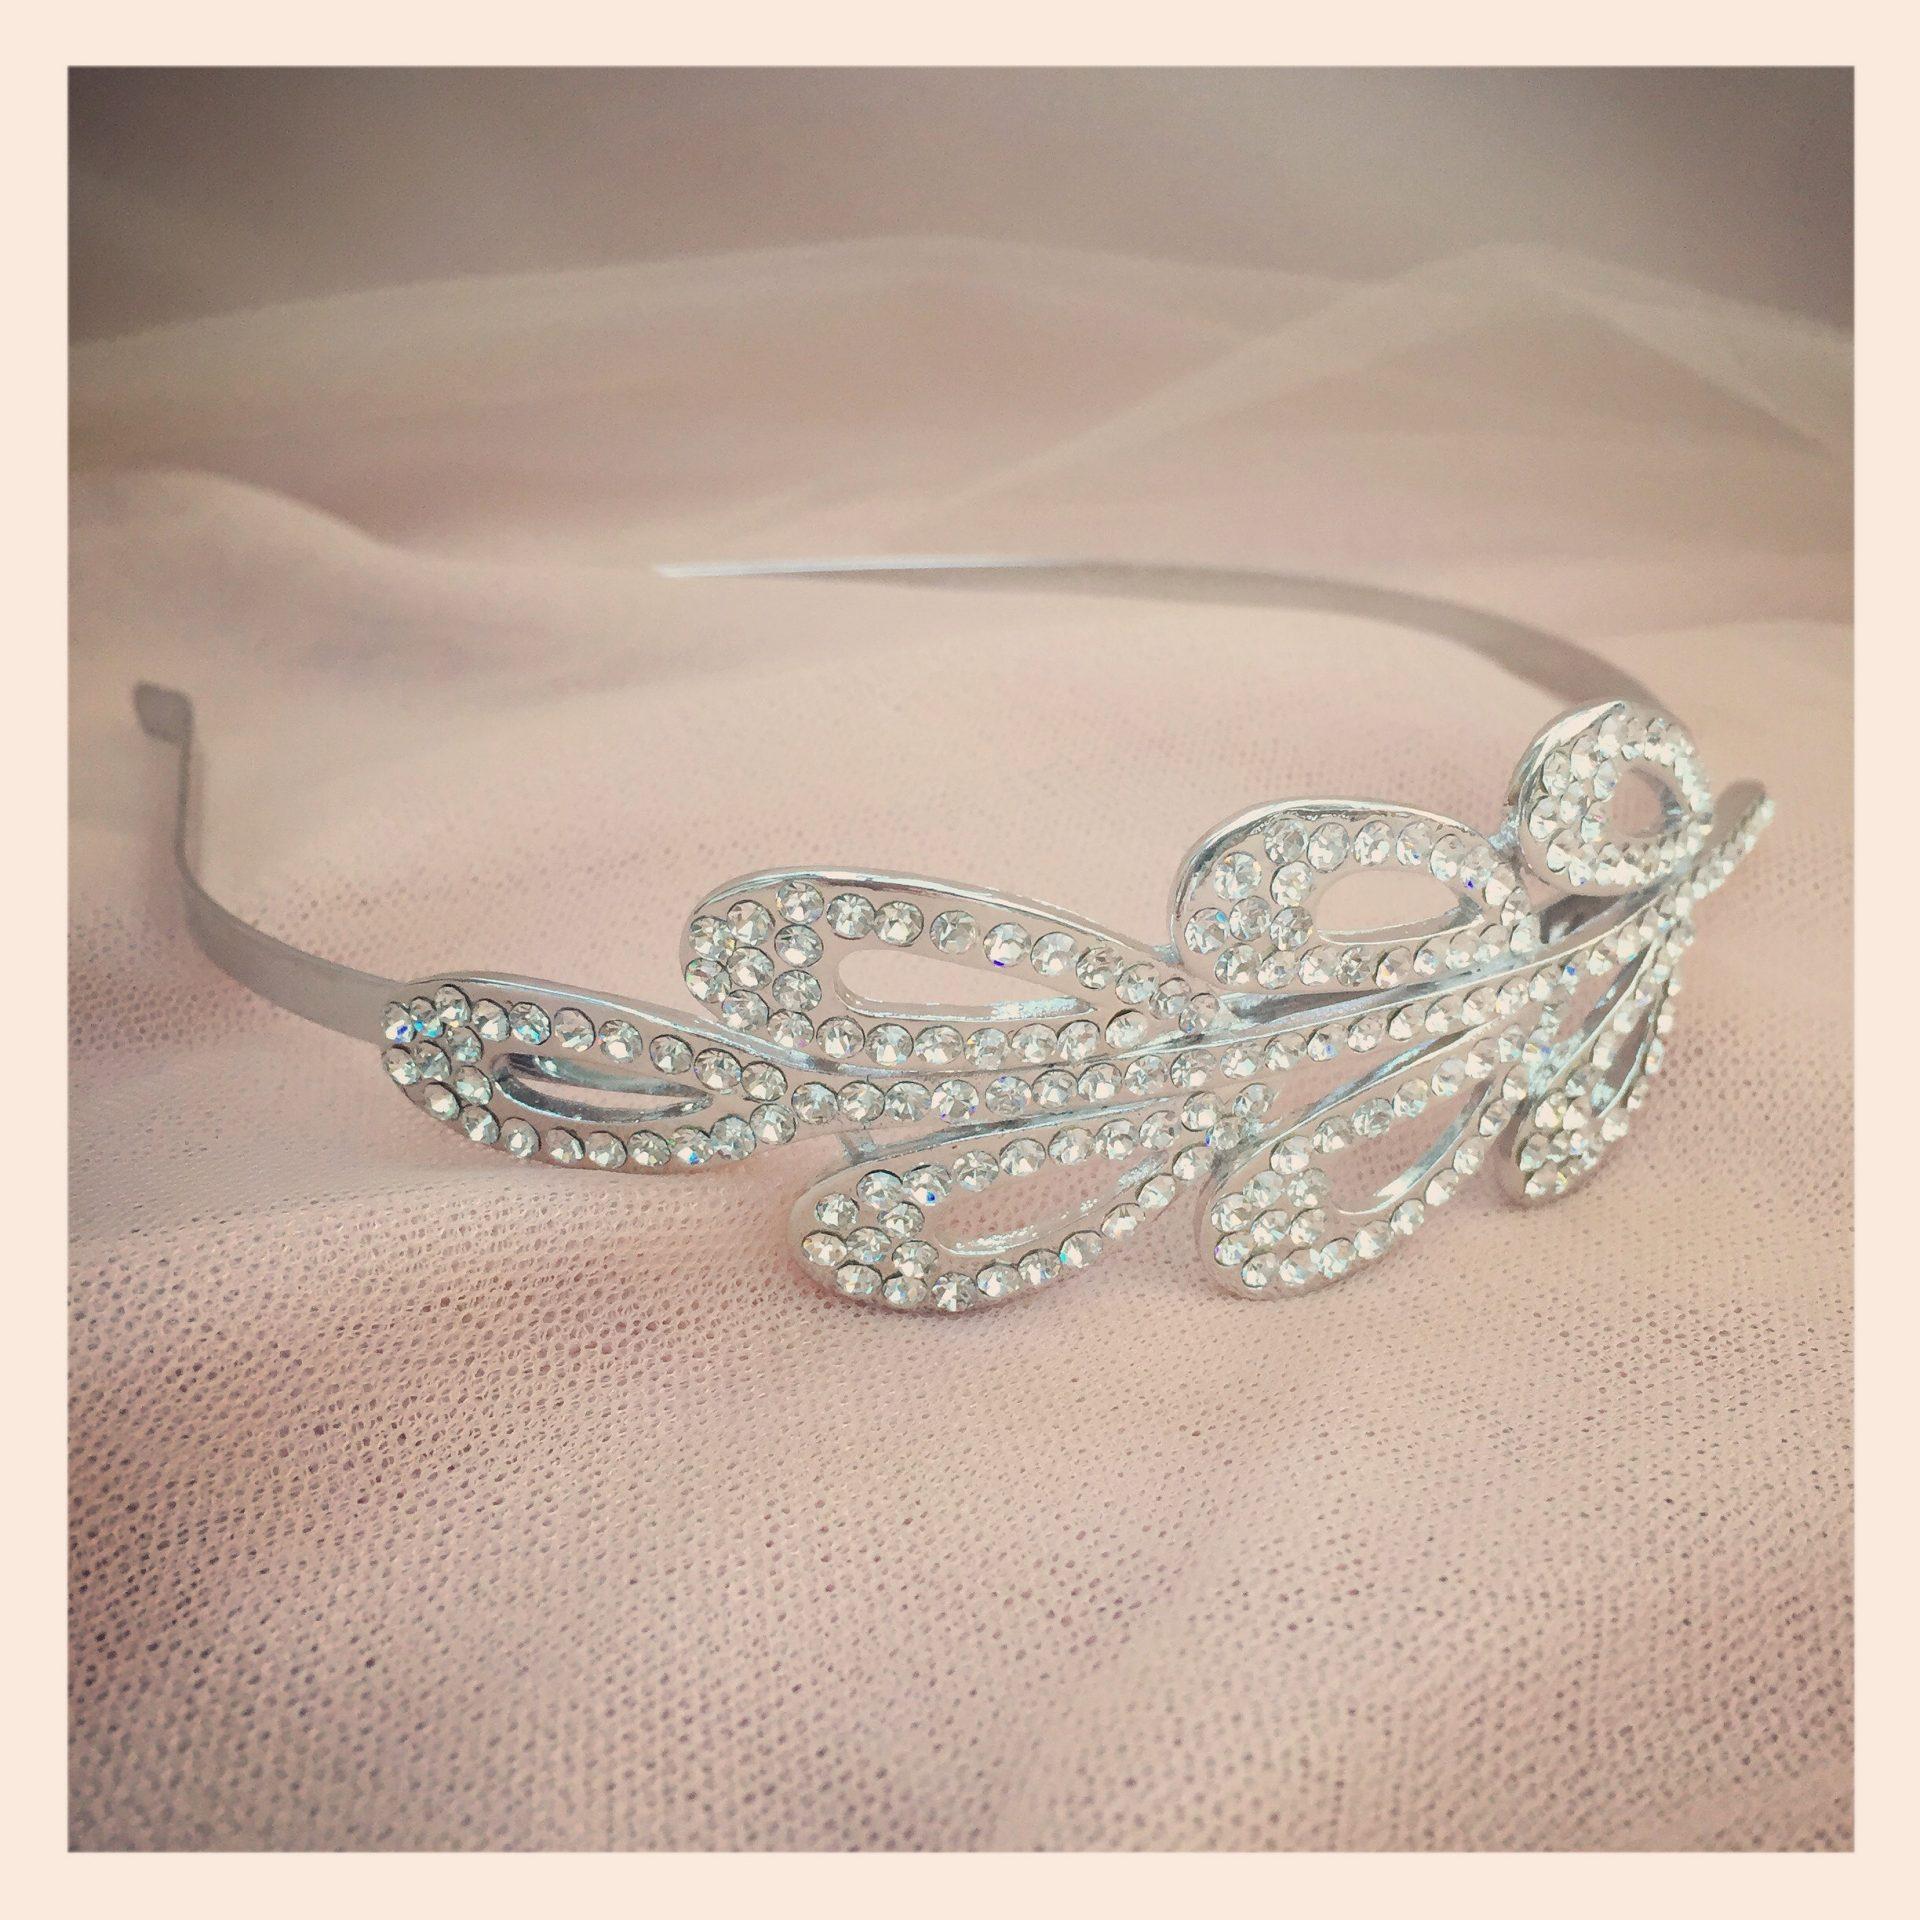 8a. Divine – Headband